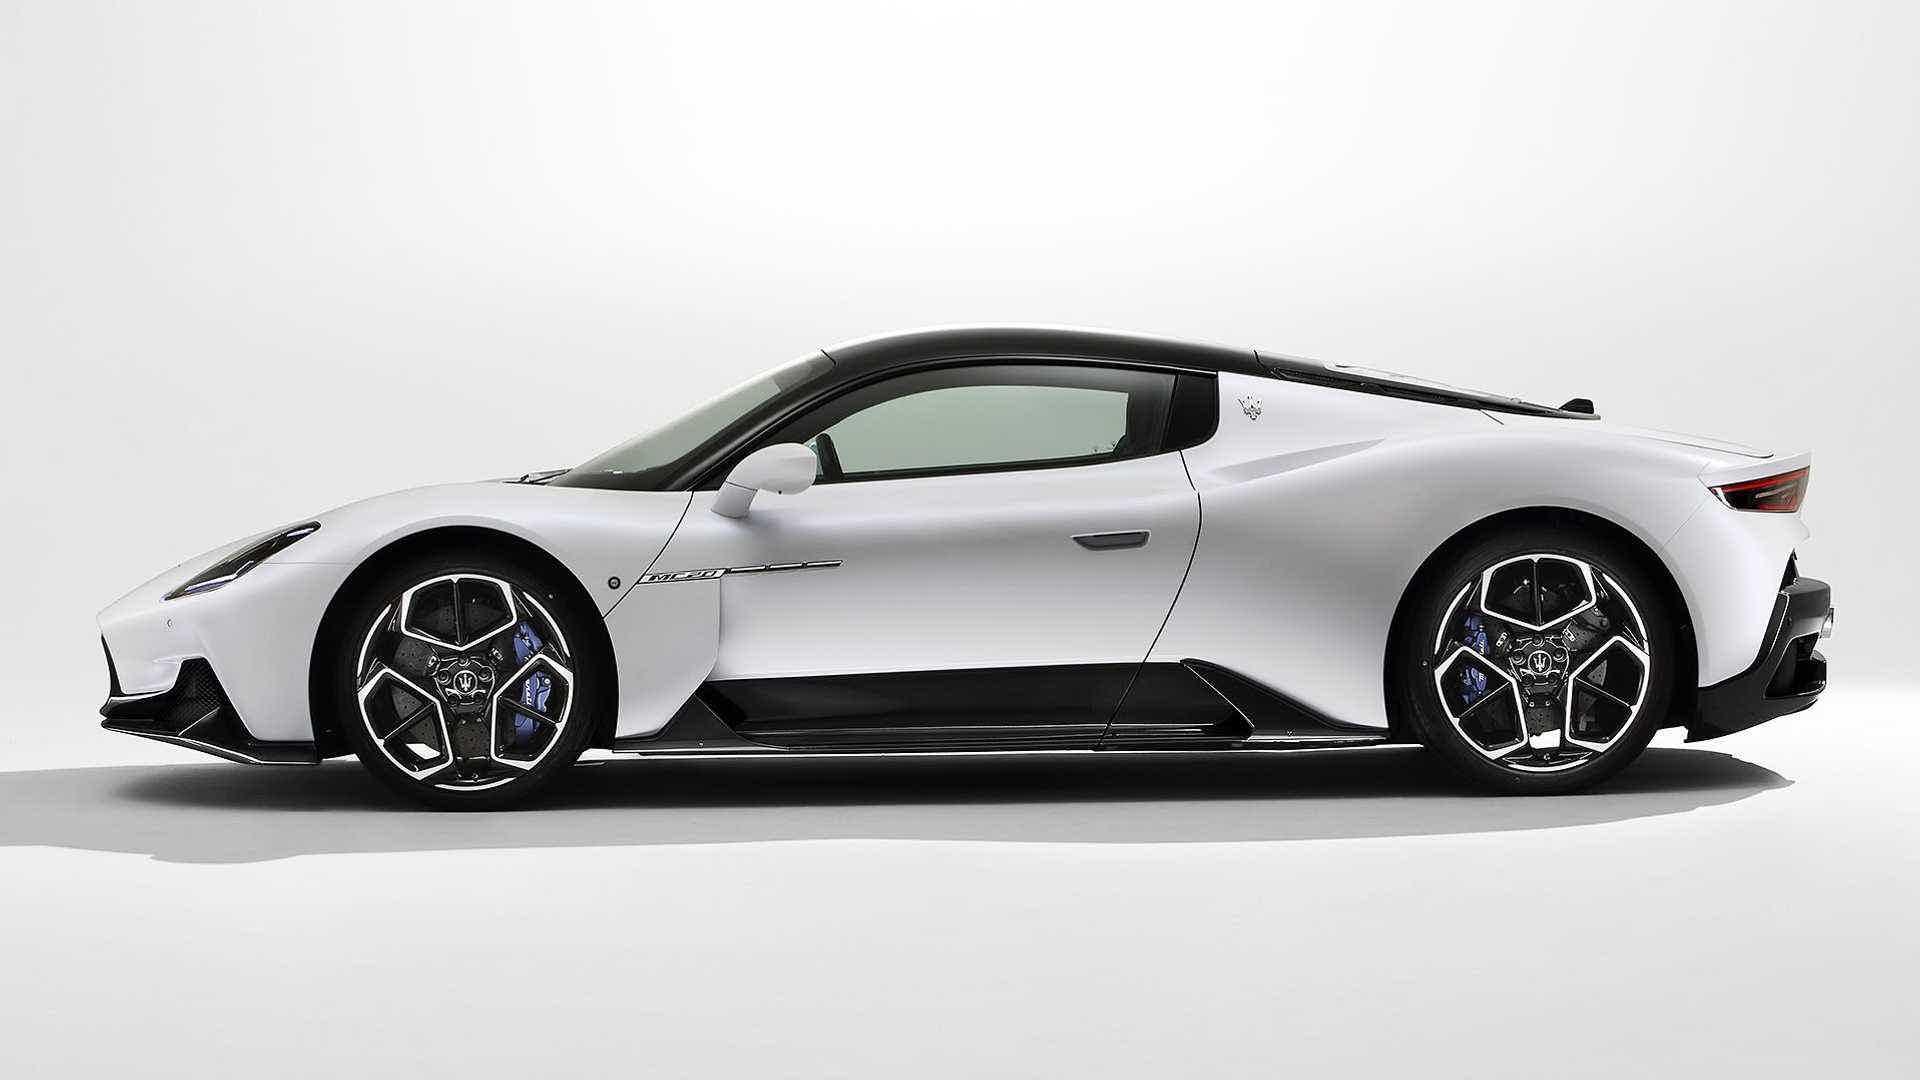 Design Maserati MC20